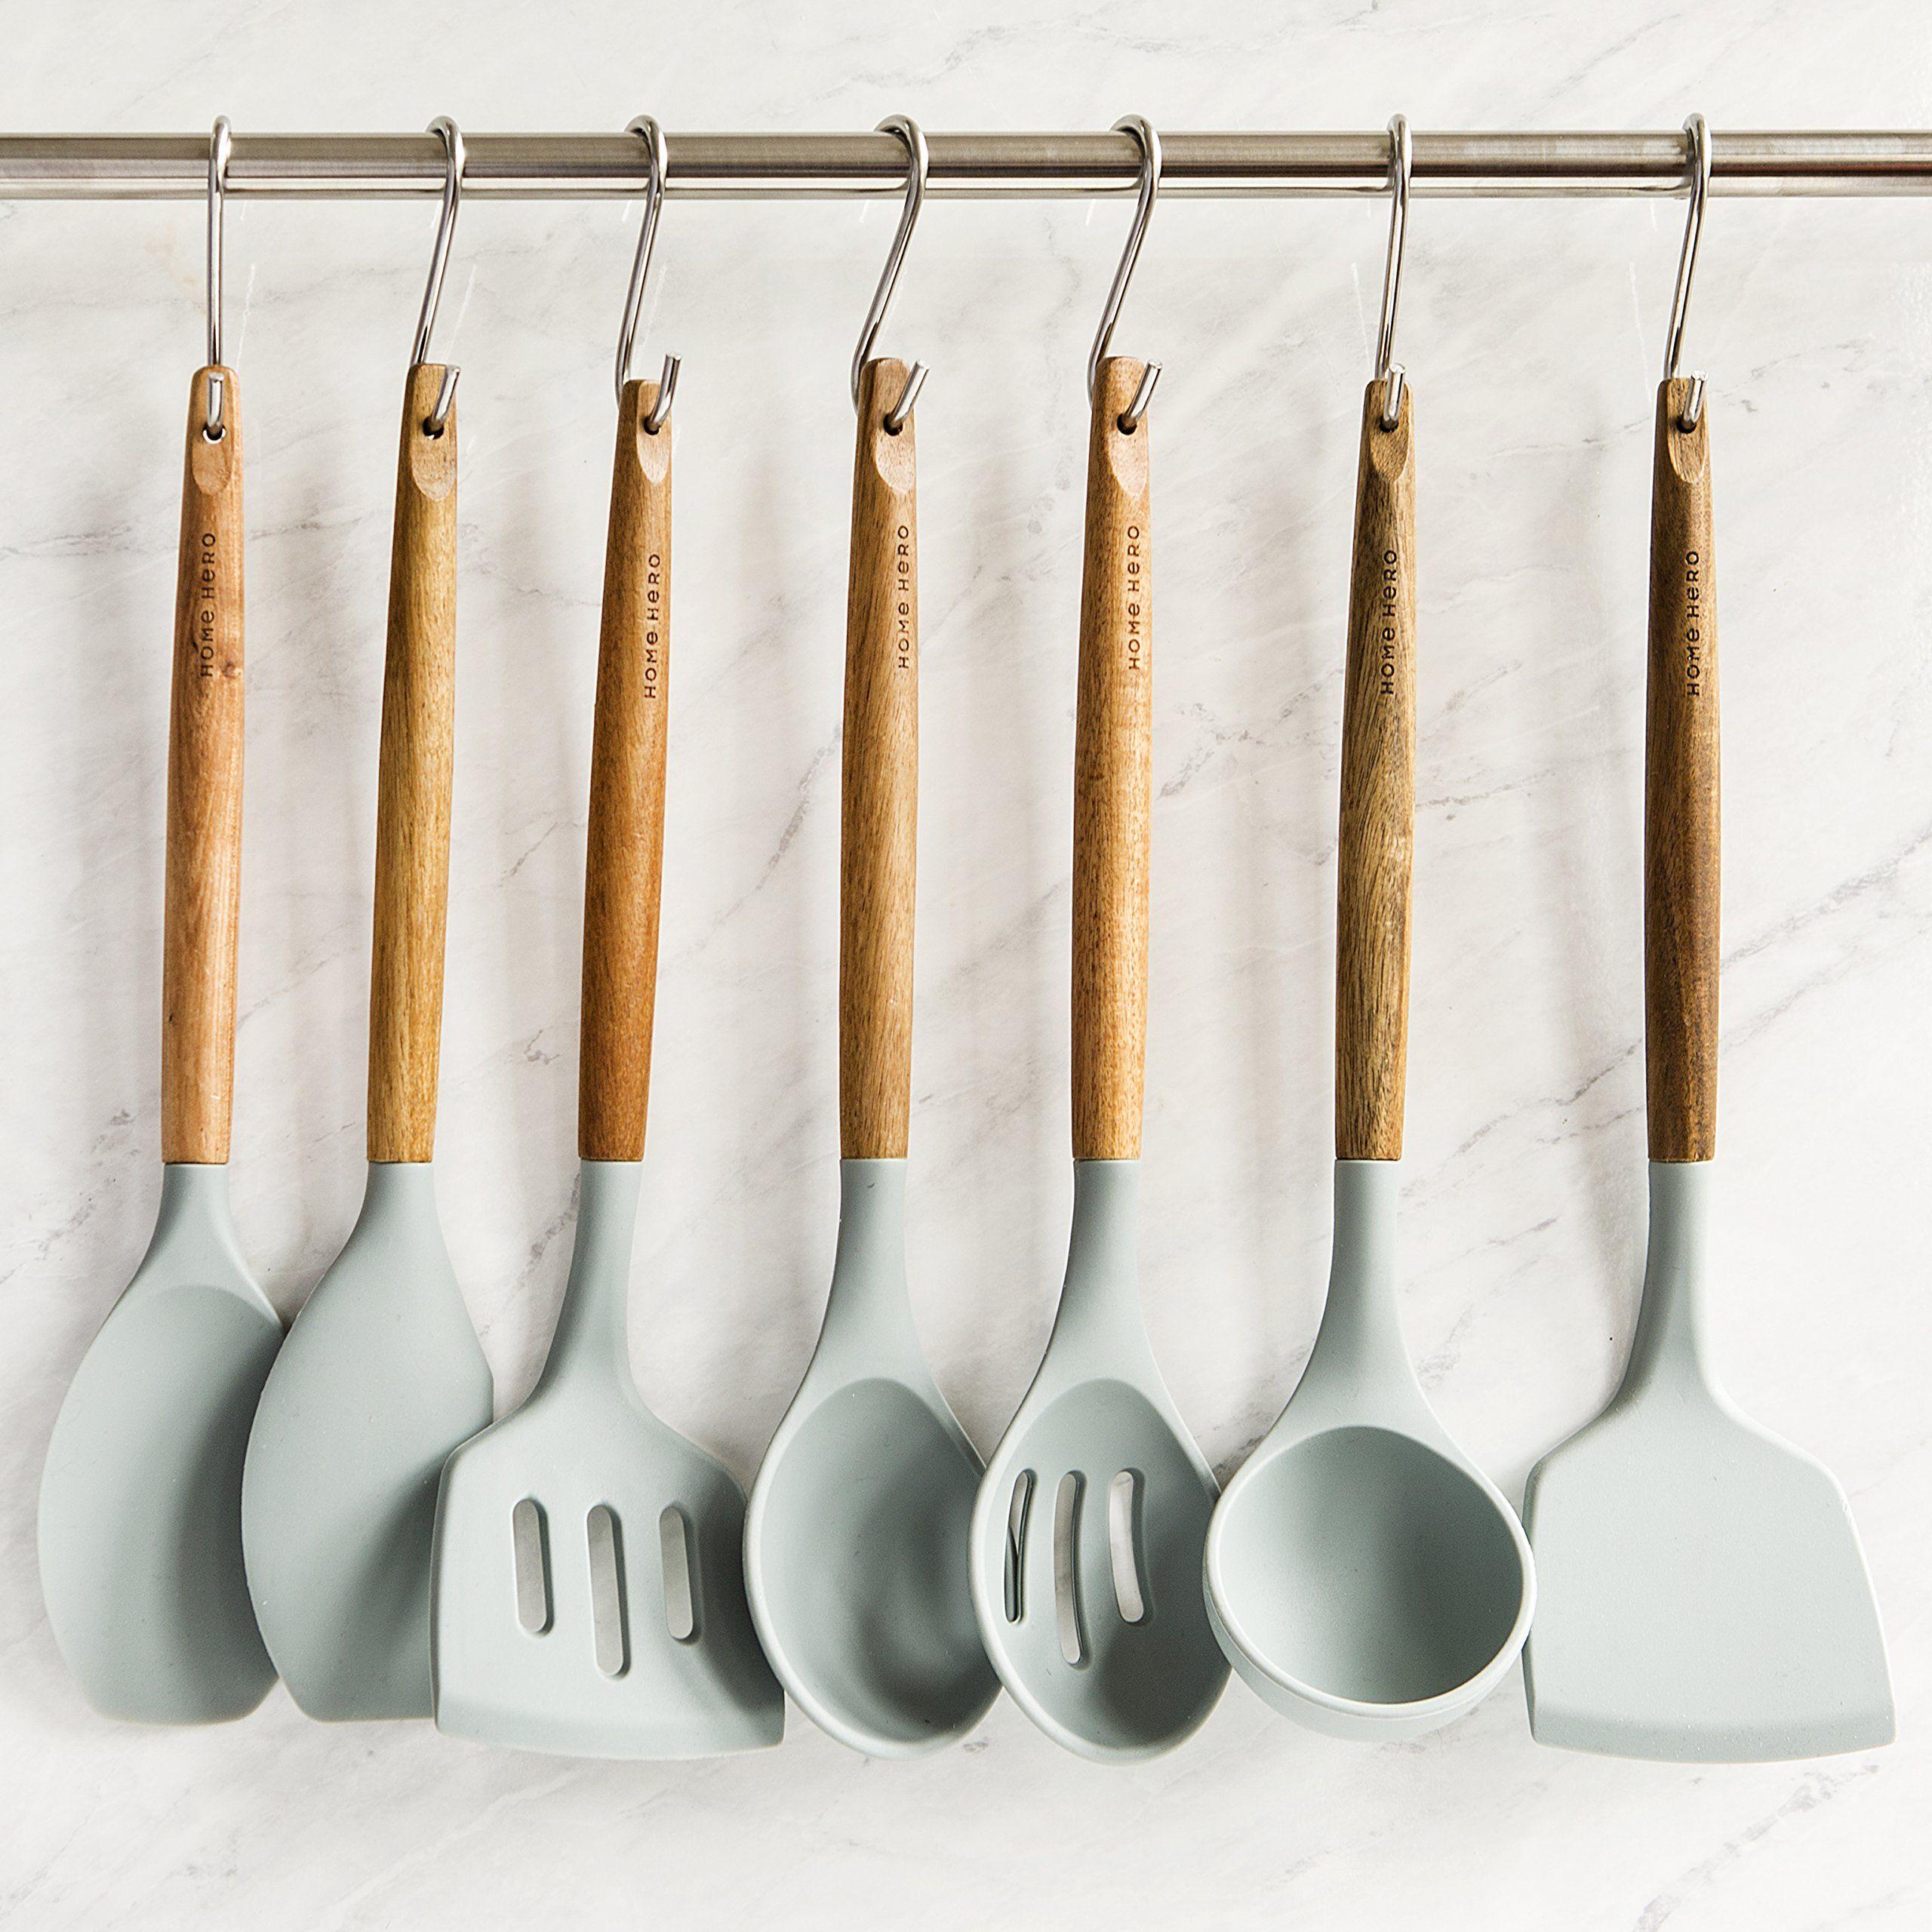 Silicone Cooking Utensils Kitchen Utensil Set 8 Natural Acacia